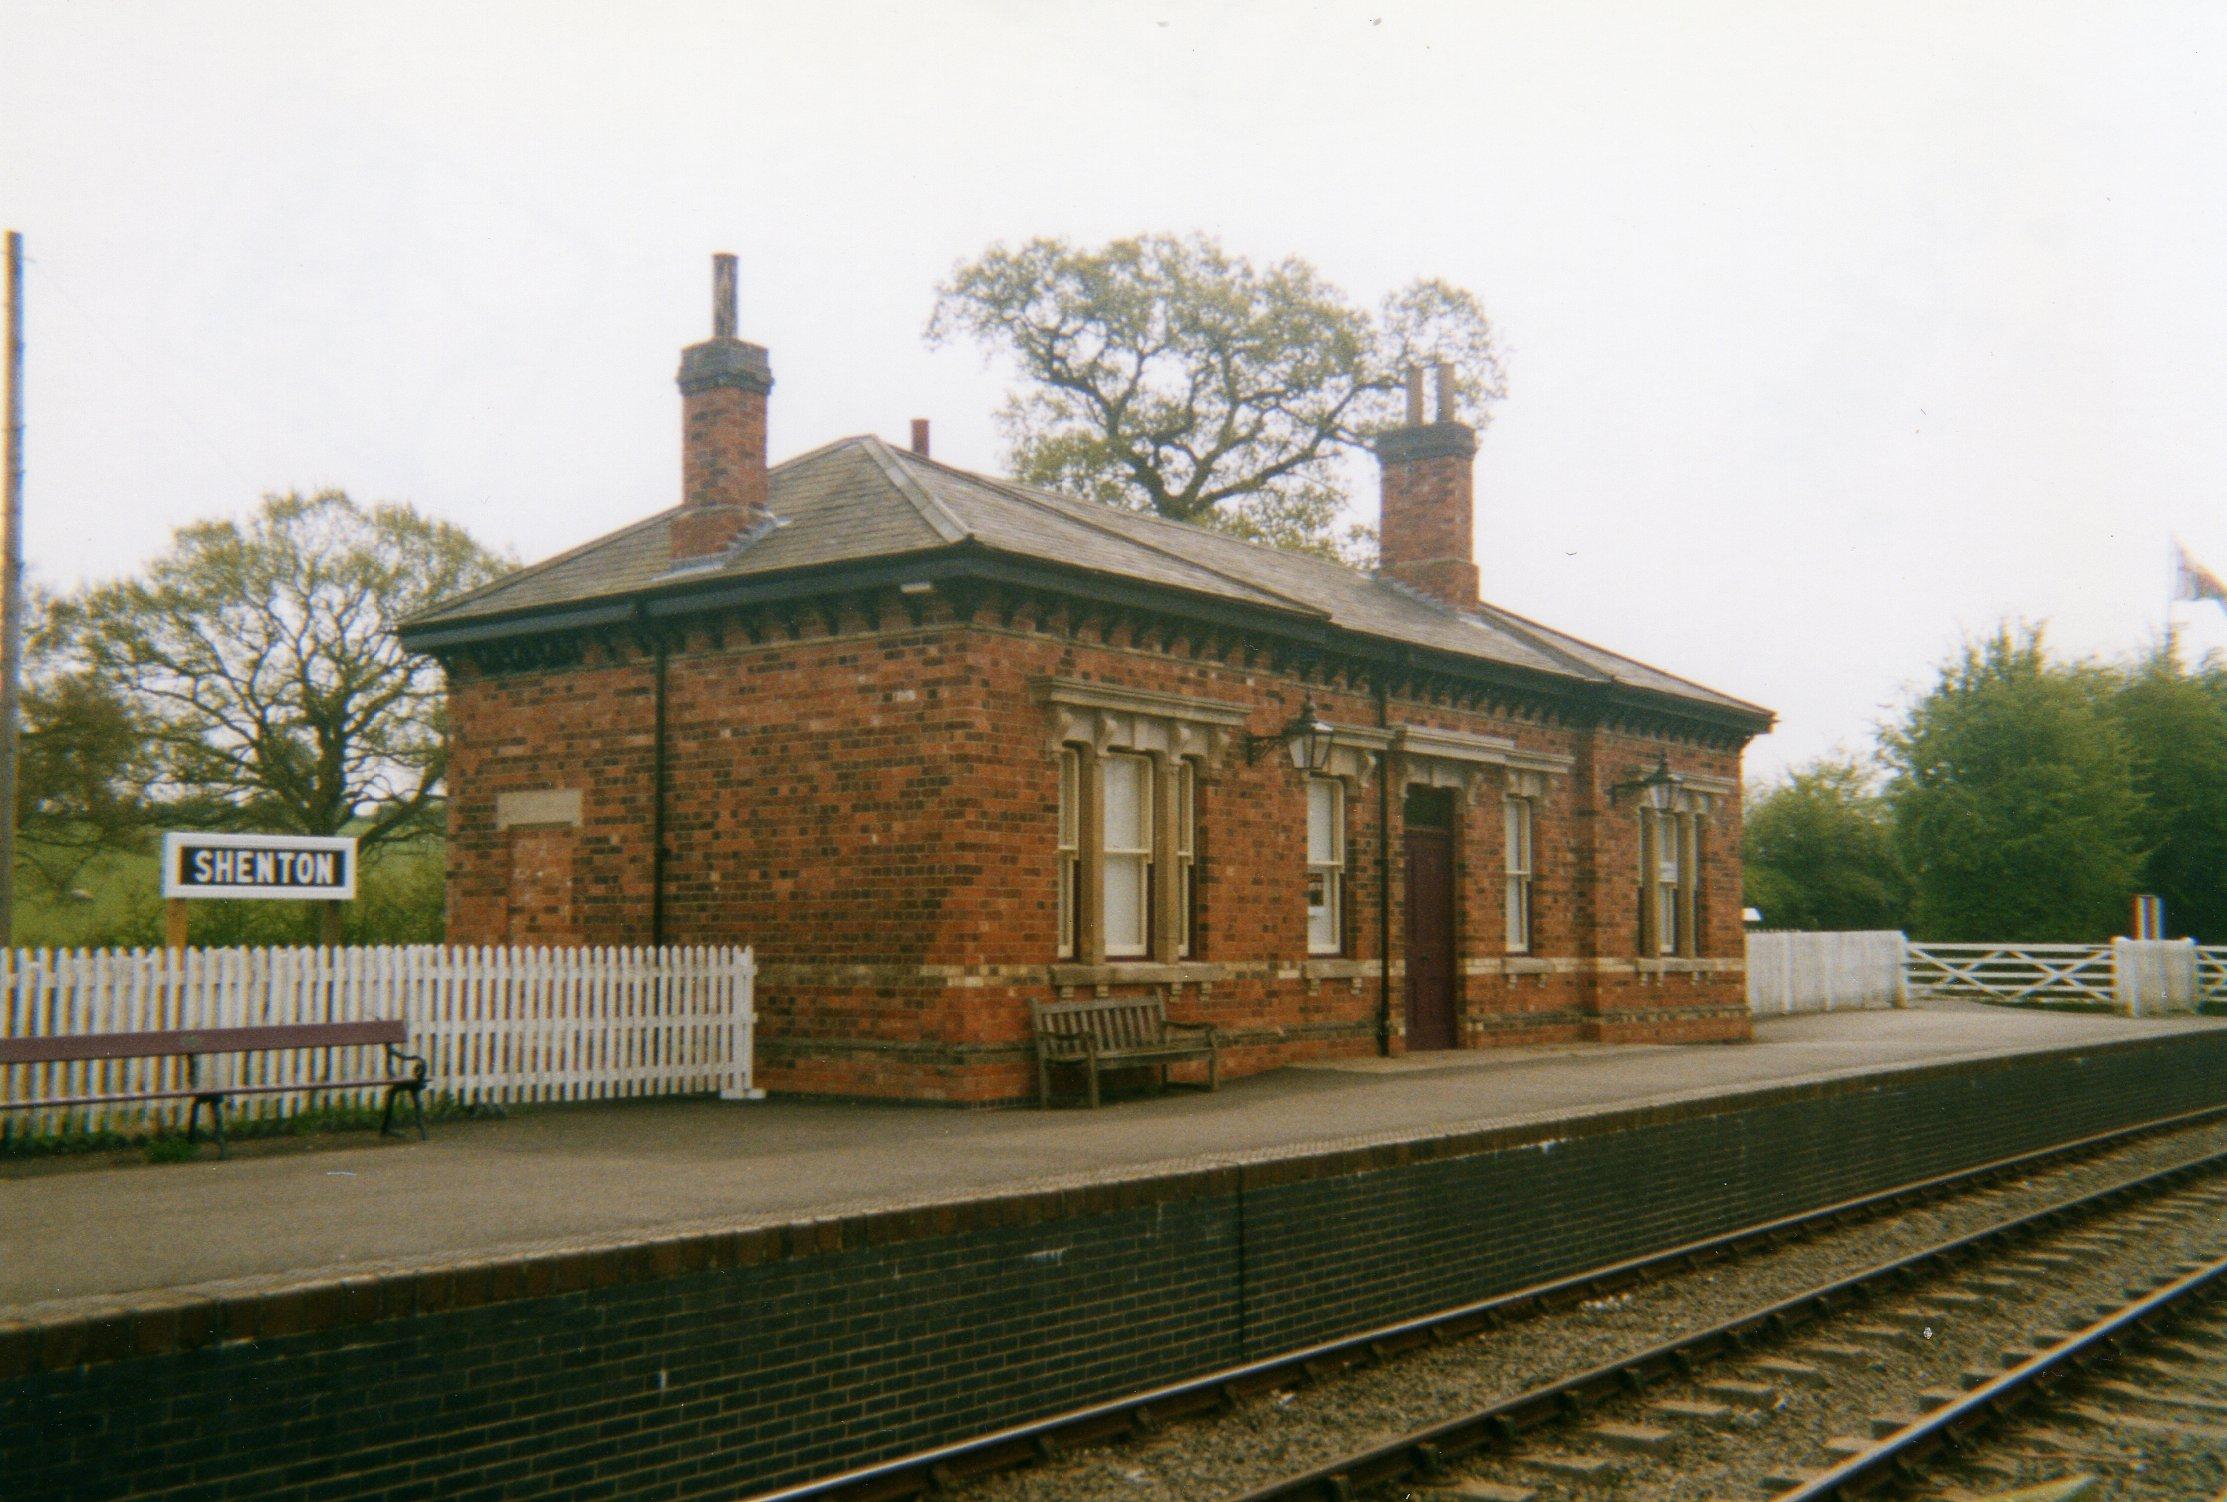 Shenton Up Platform